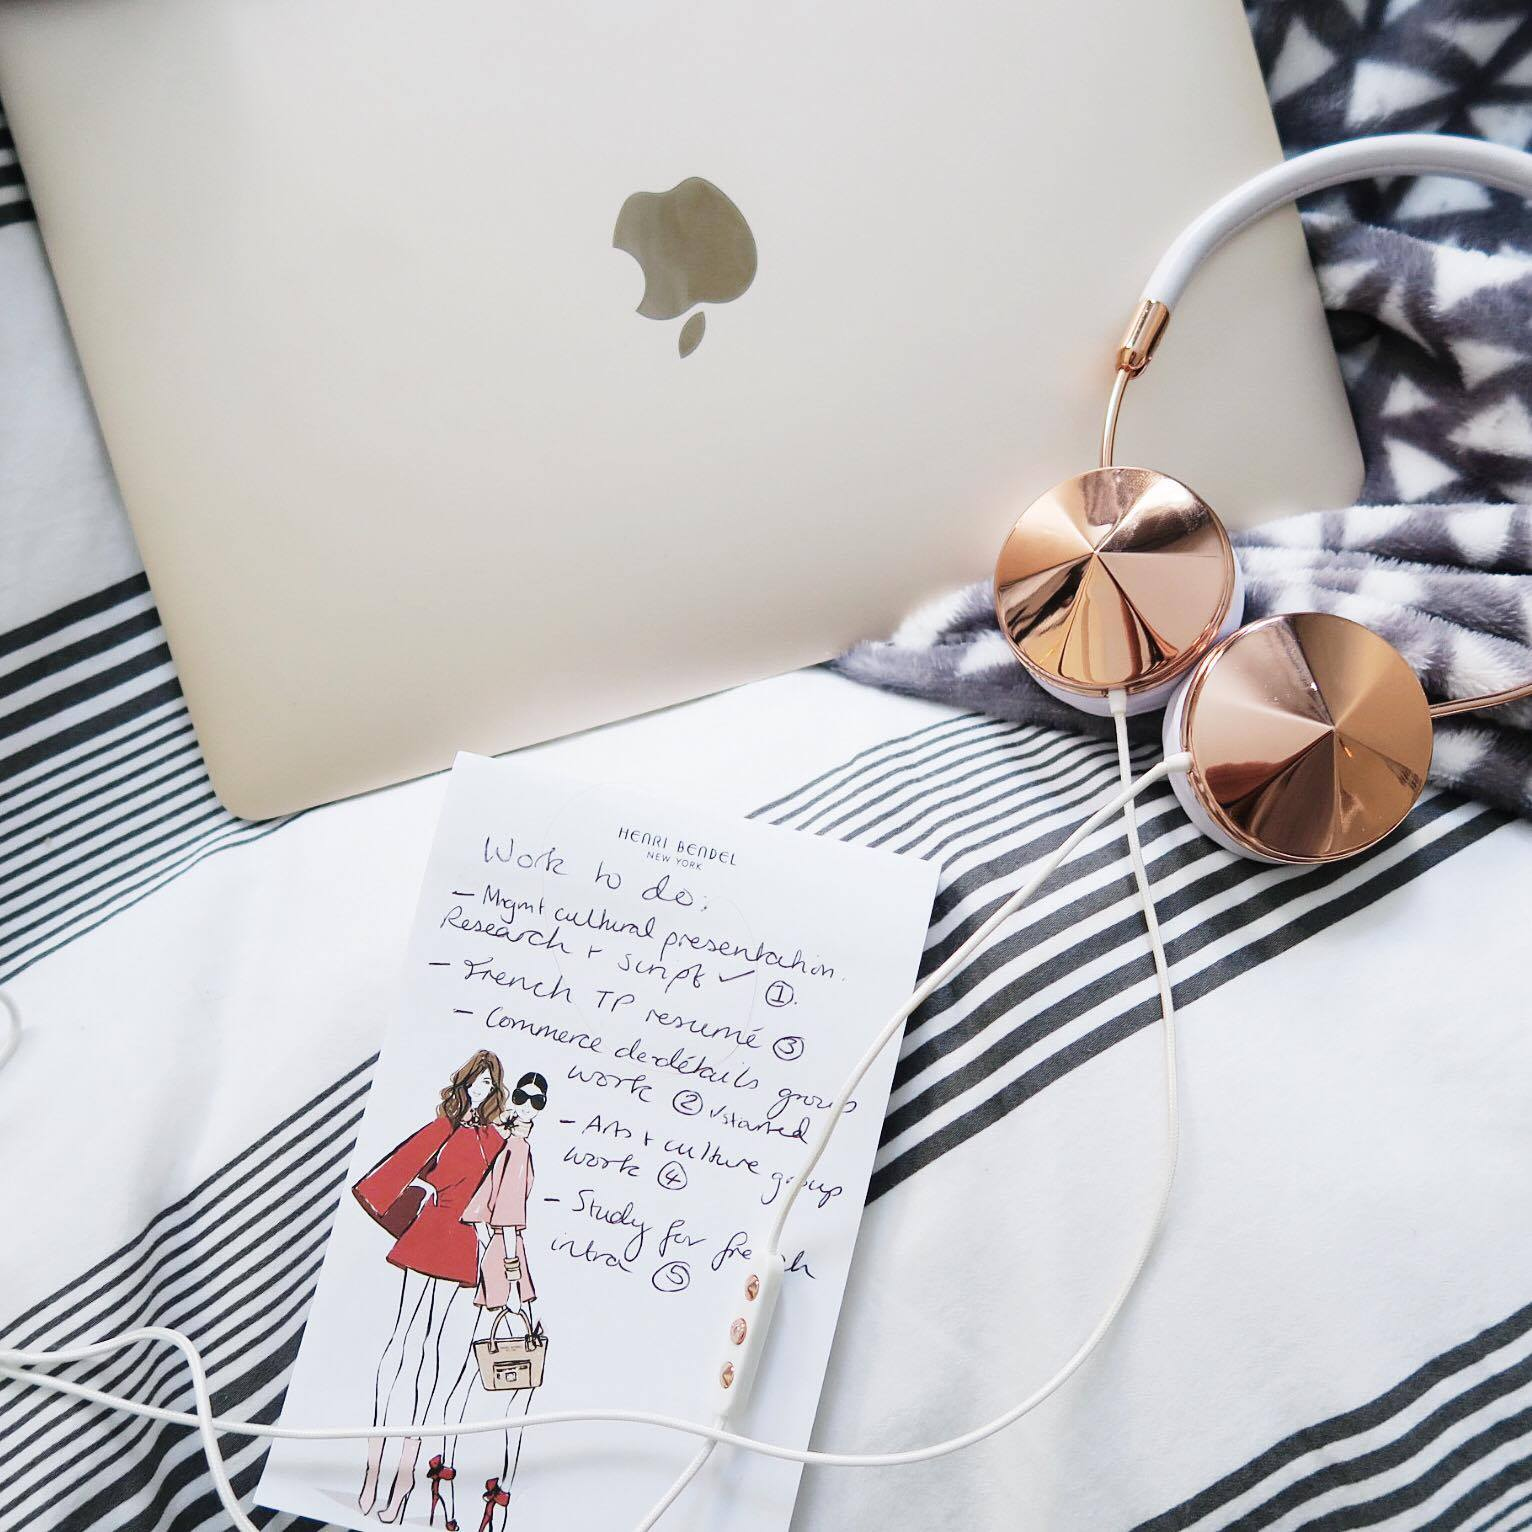 Studying inspiration